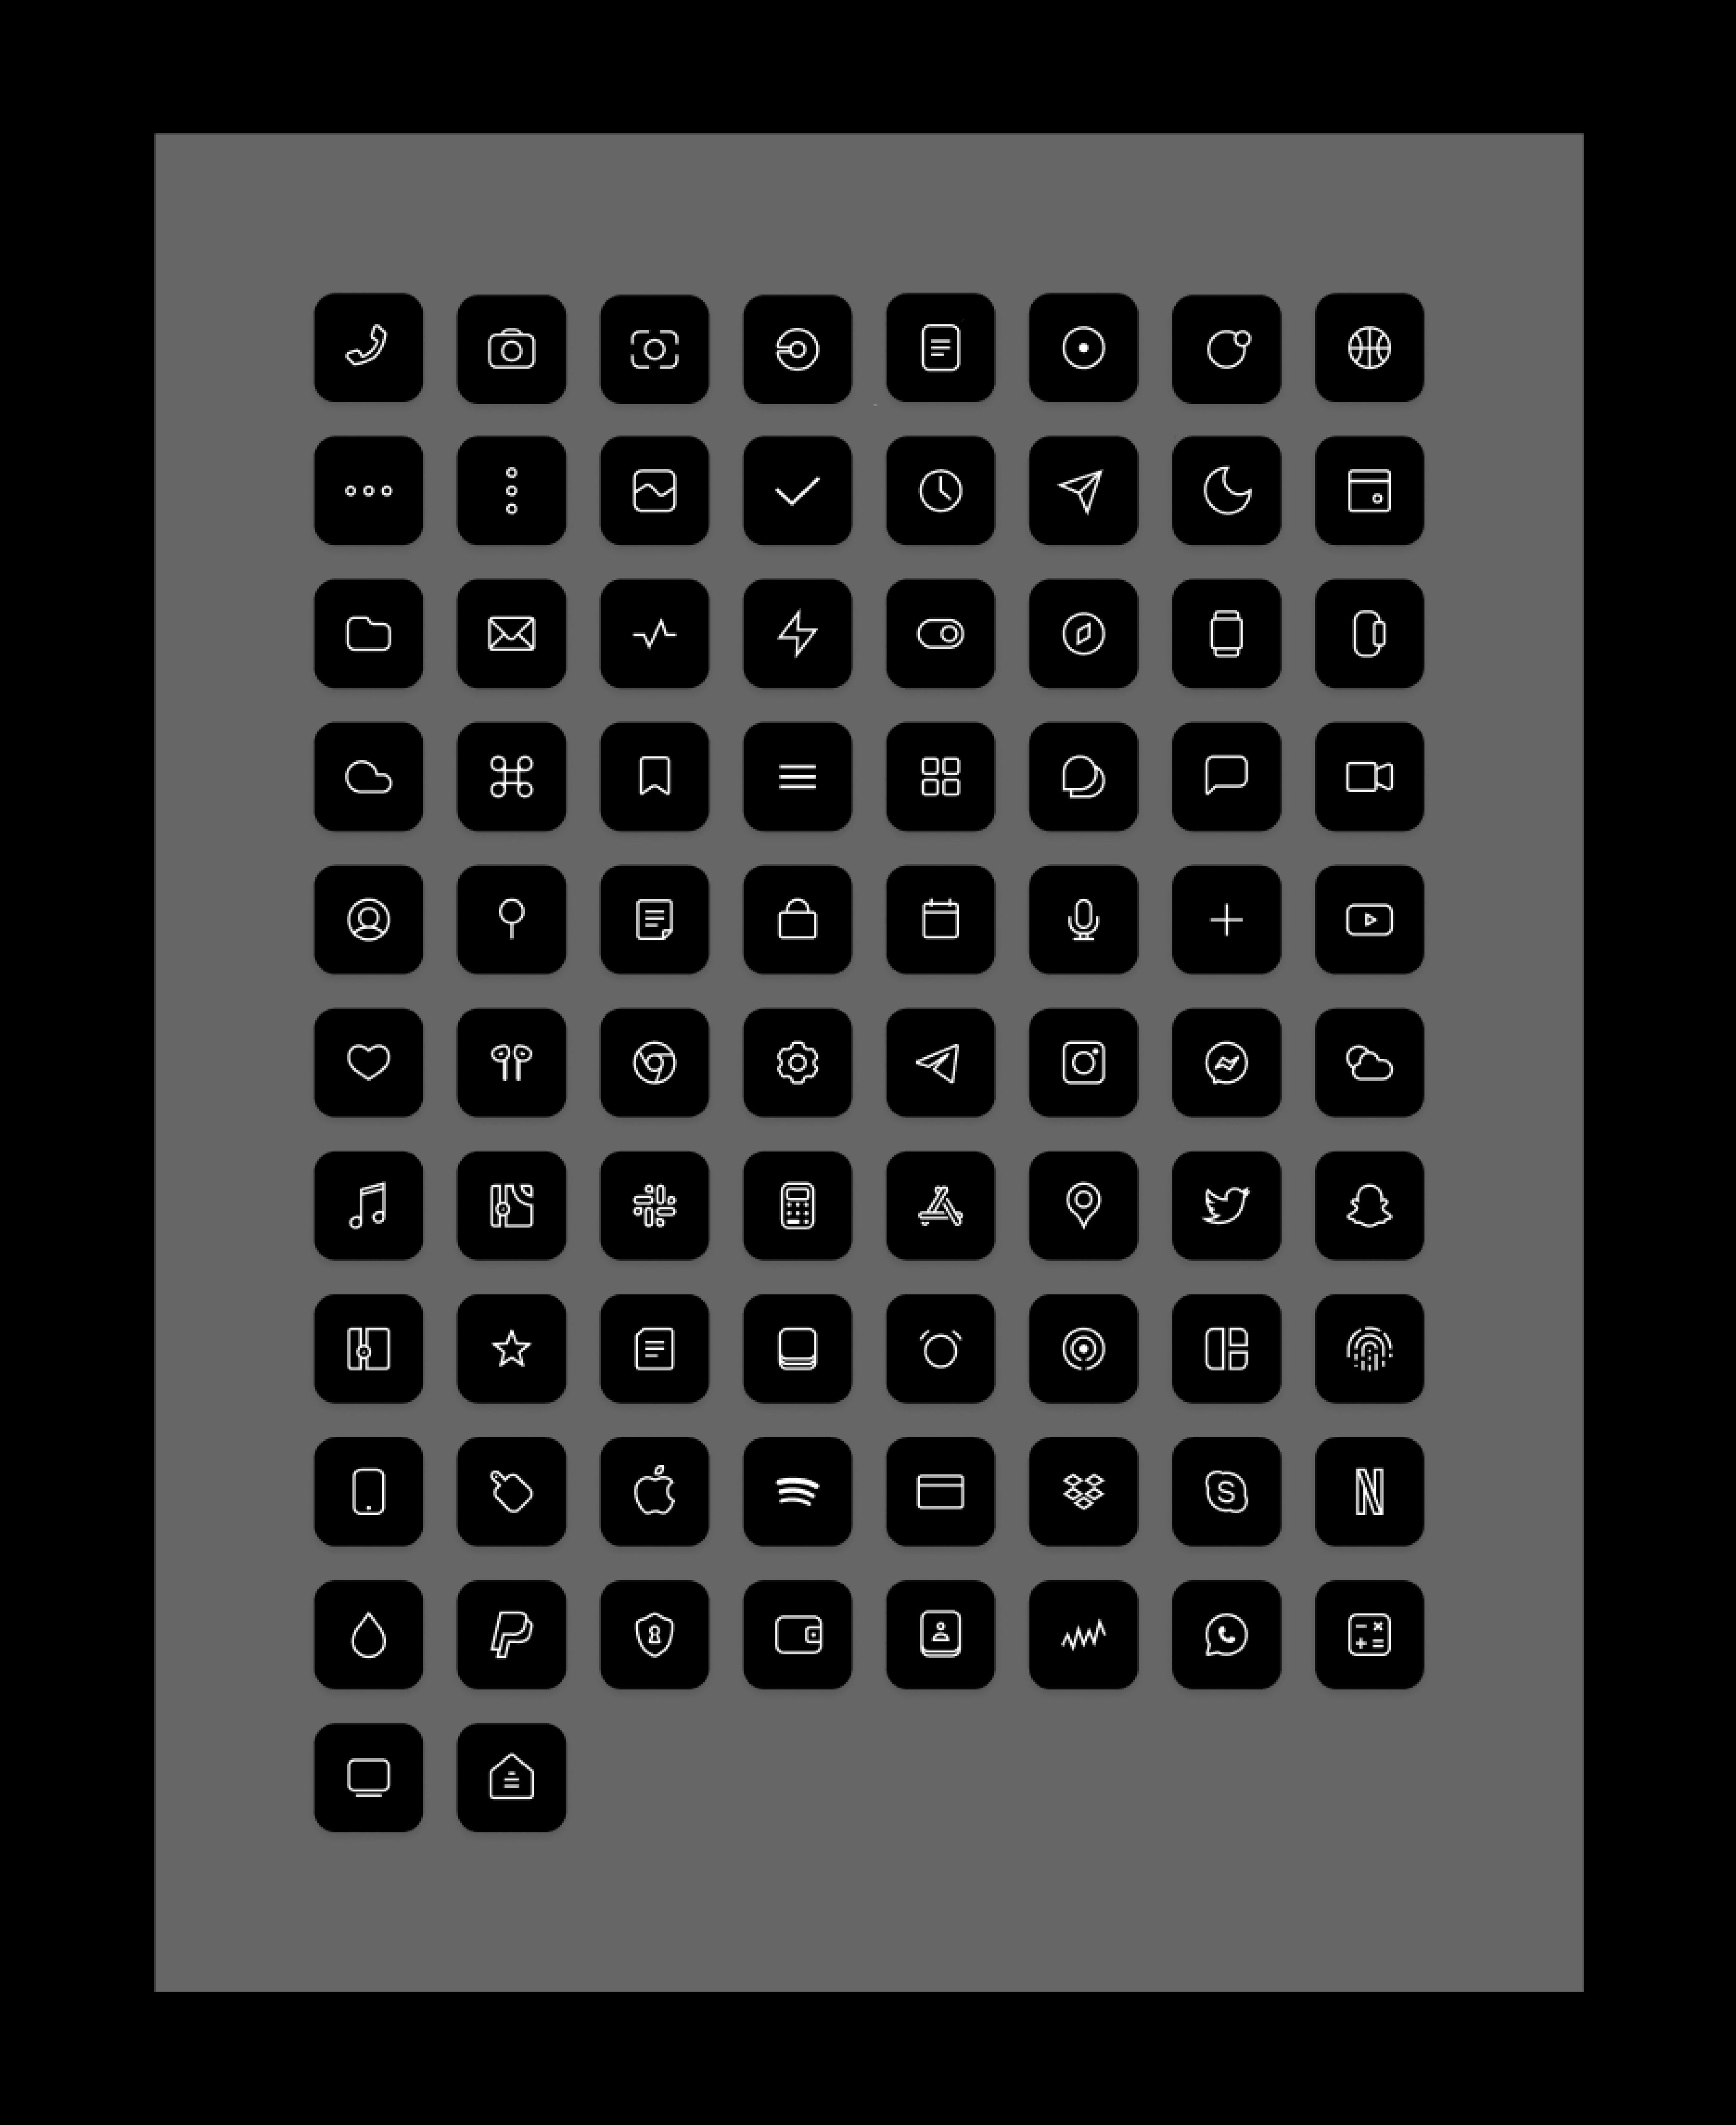 Ios 14 Icons Set Icon Set Iphone Wallpaper App Iphone App Design